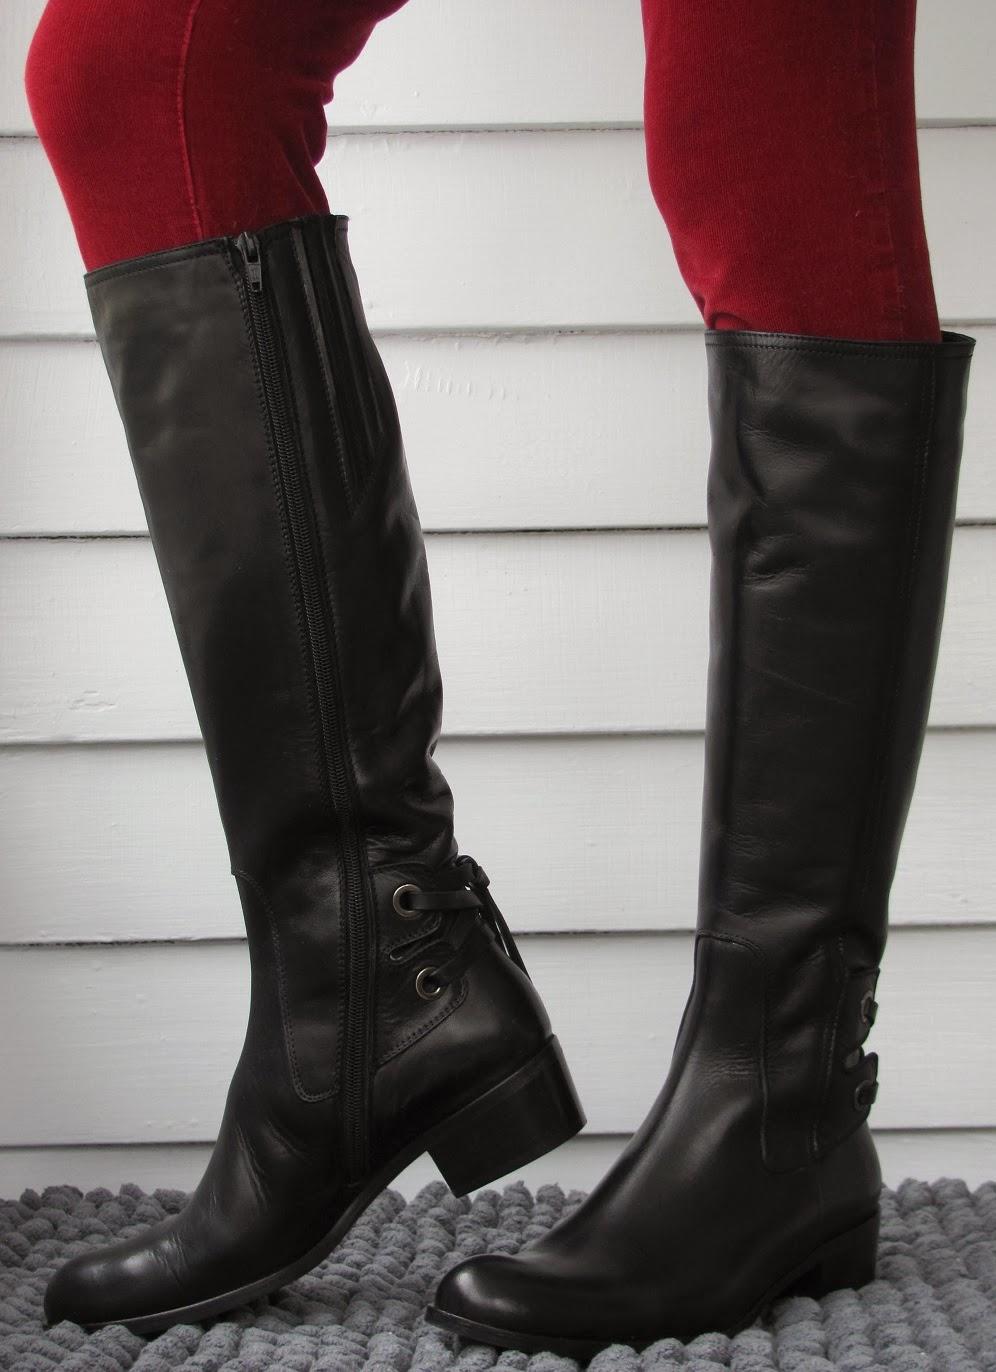 Howdy Slim Riding Boots For Thin Calves Sesto Meucci Boyle